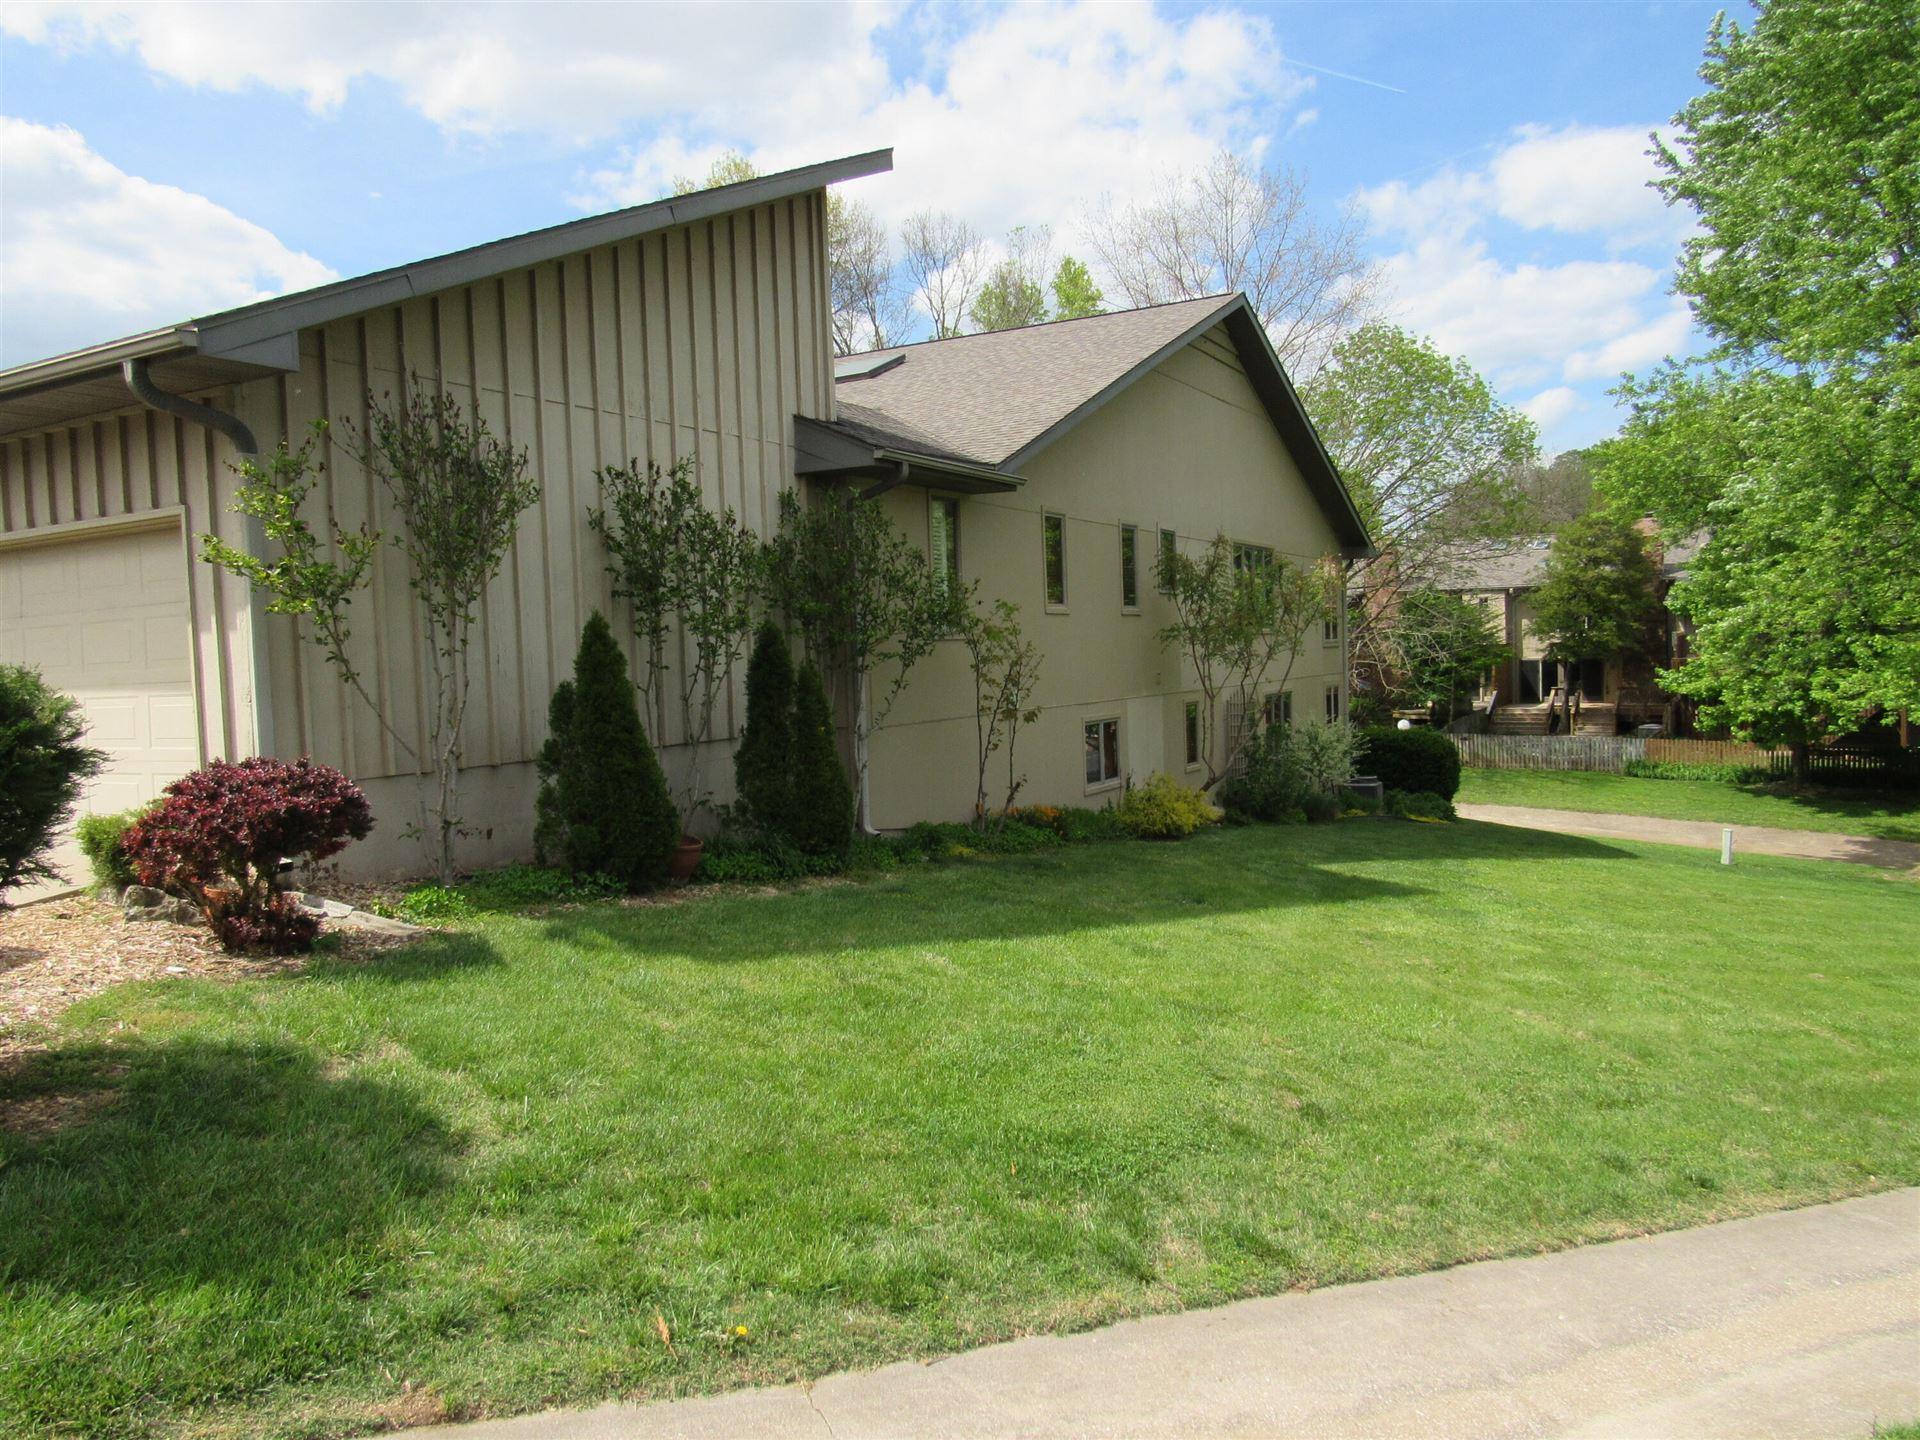 Photo of 3543 East Cinnamon Place, Springfield, MO 65809 (MLS # 60192180)